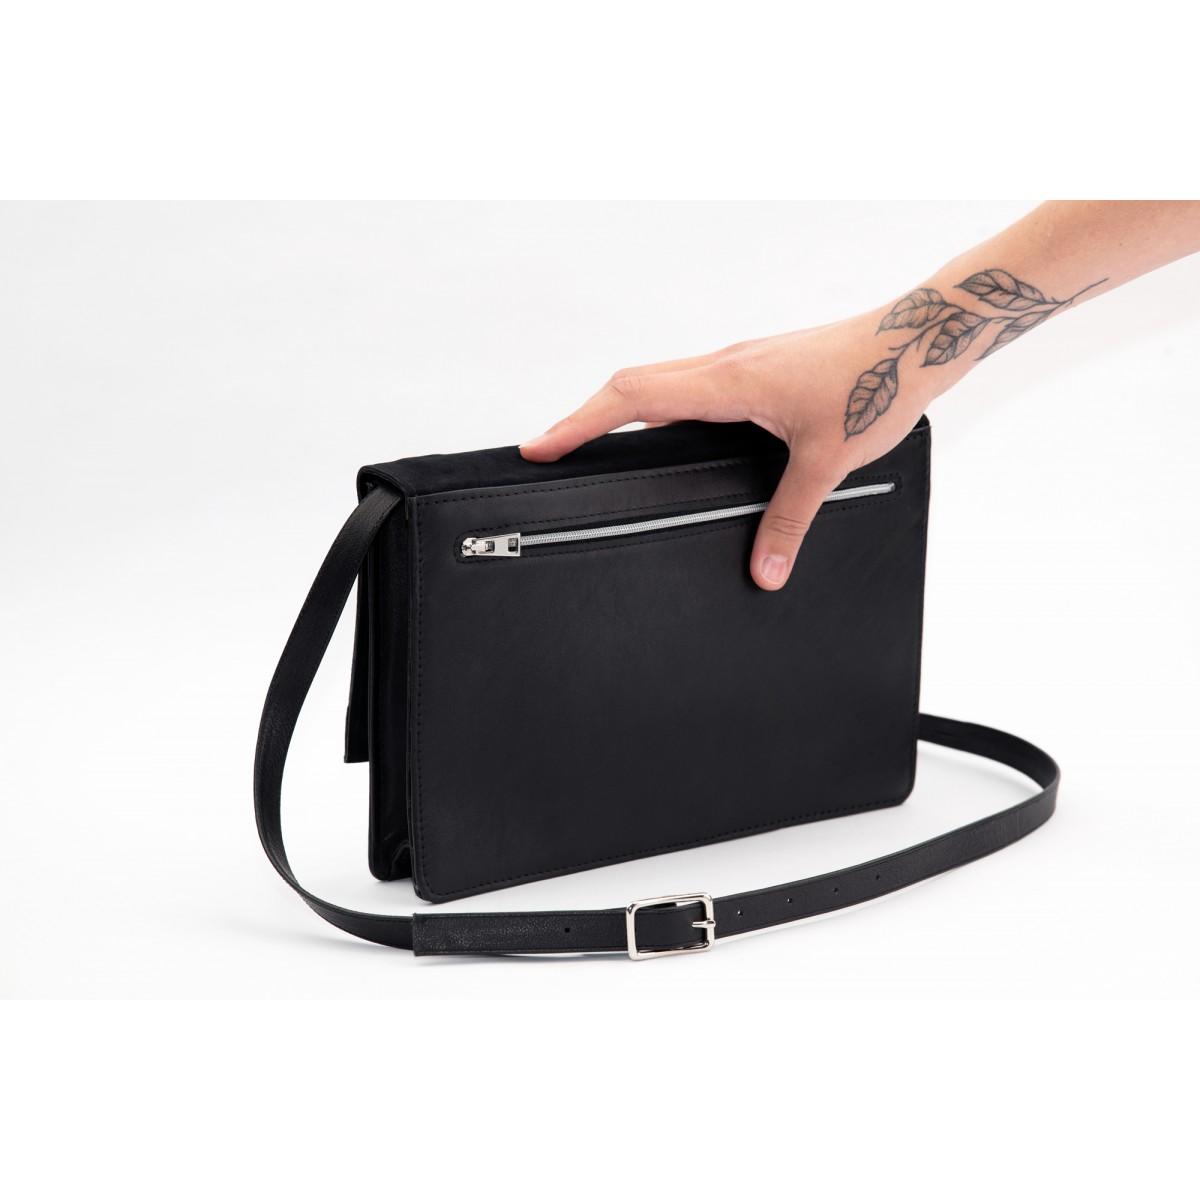 frisch Handtasche ZADAR